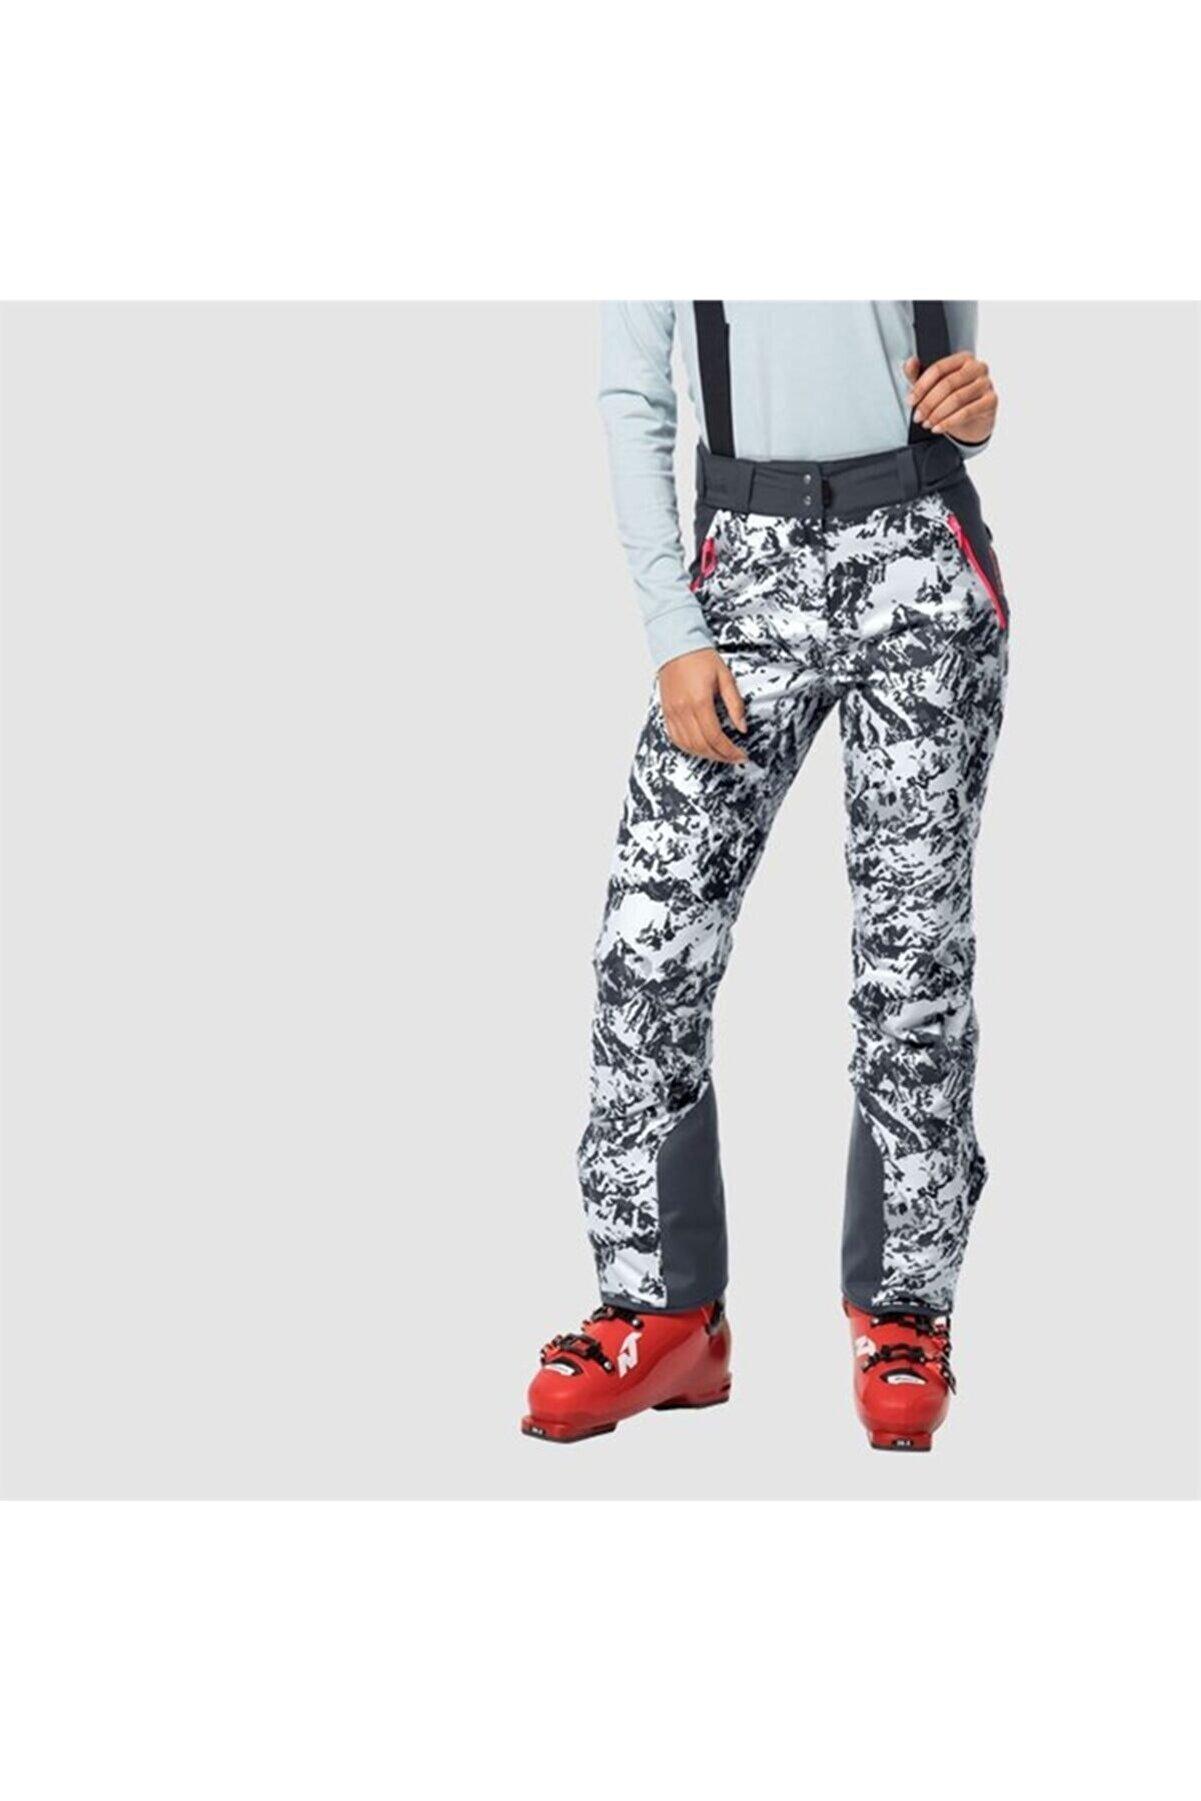 Jack Wolfskin Kadın Beyaz Panorama Peak Pants W Outdoor Kayak Pantolonu